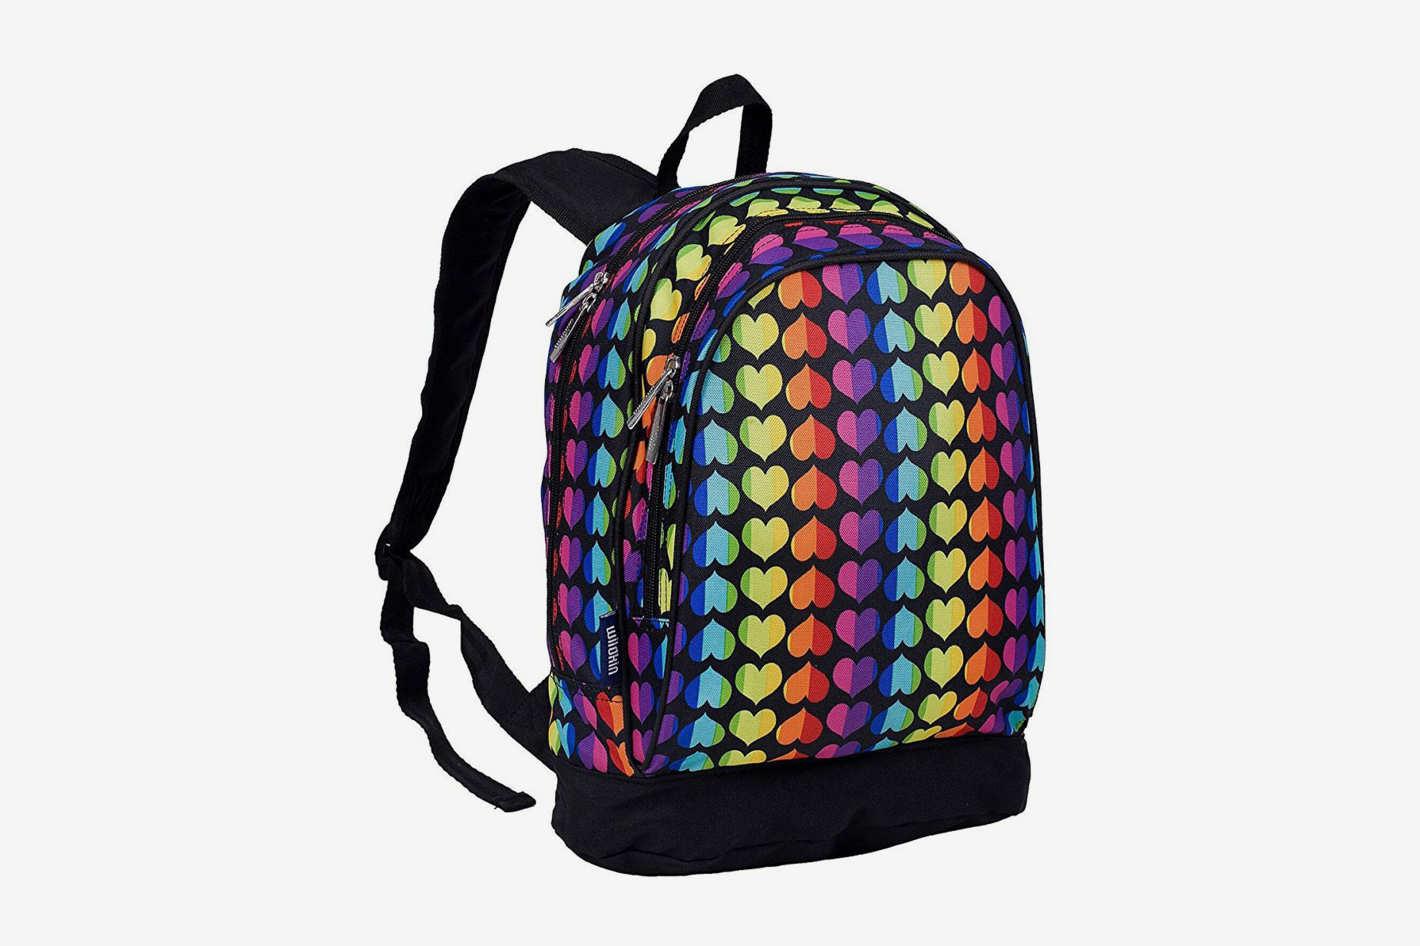 Wildkin 15 Inch Backpack